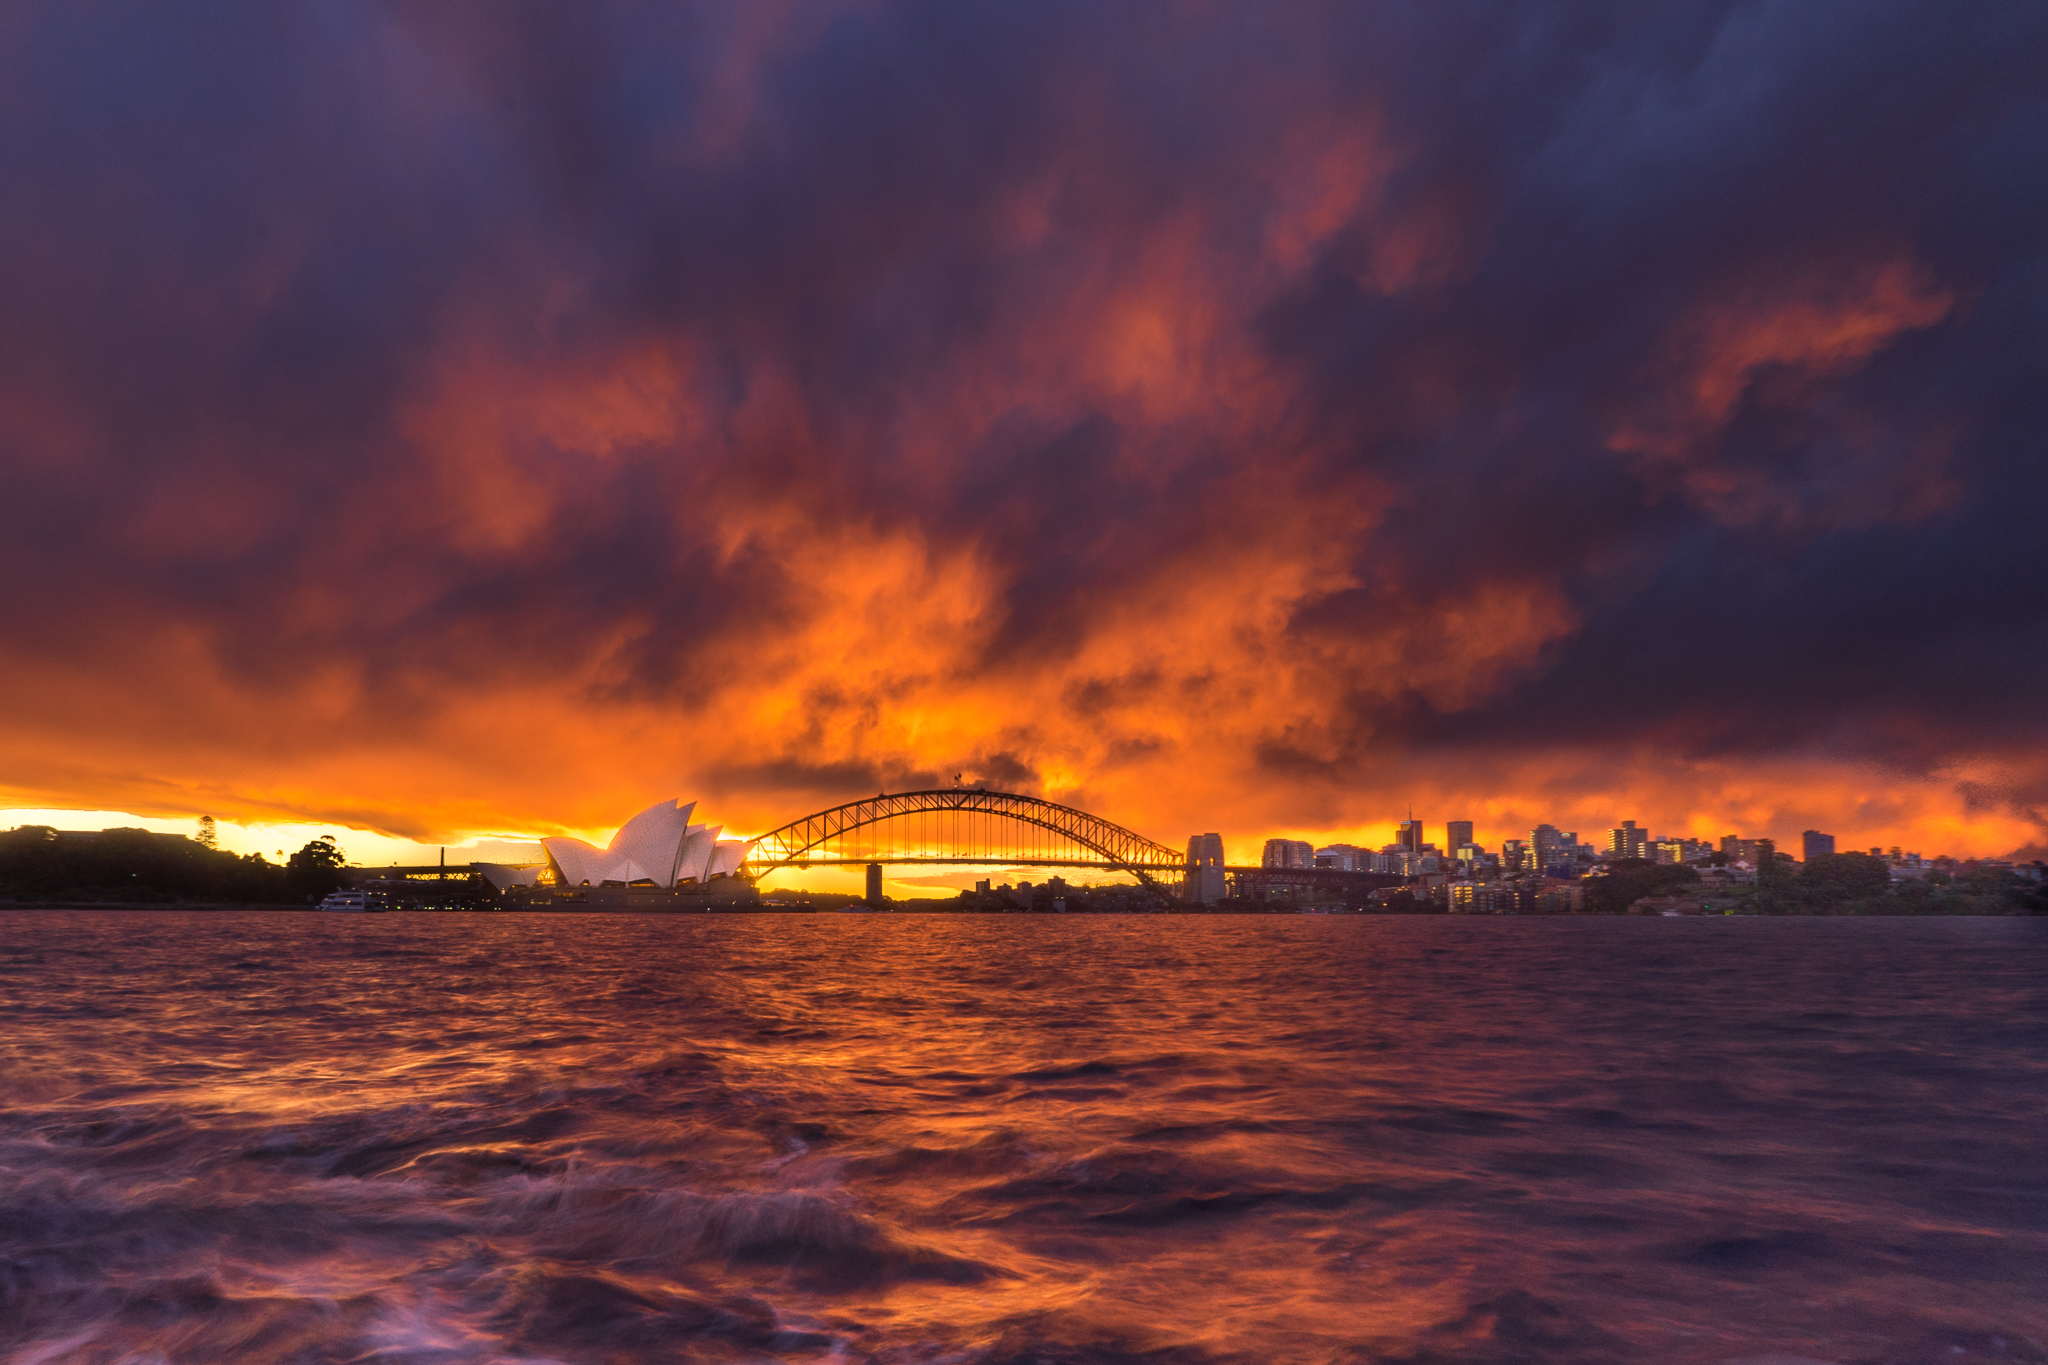 One of those rare Sydney sunsets